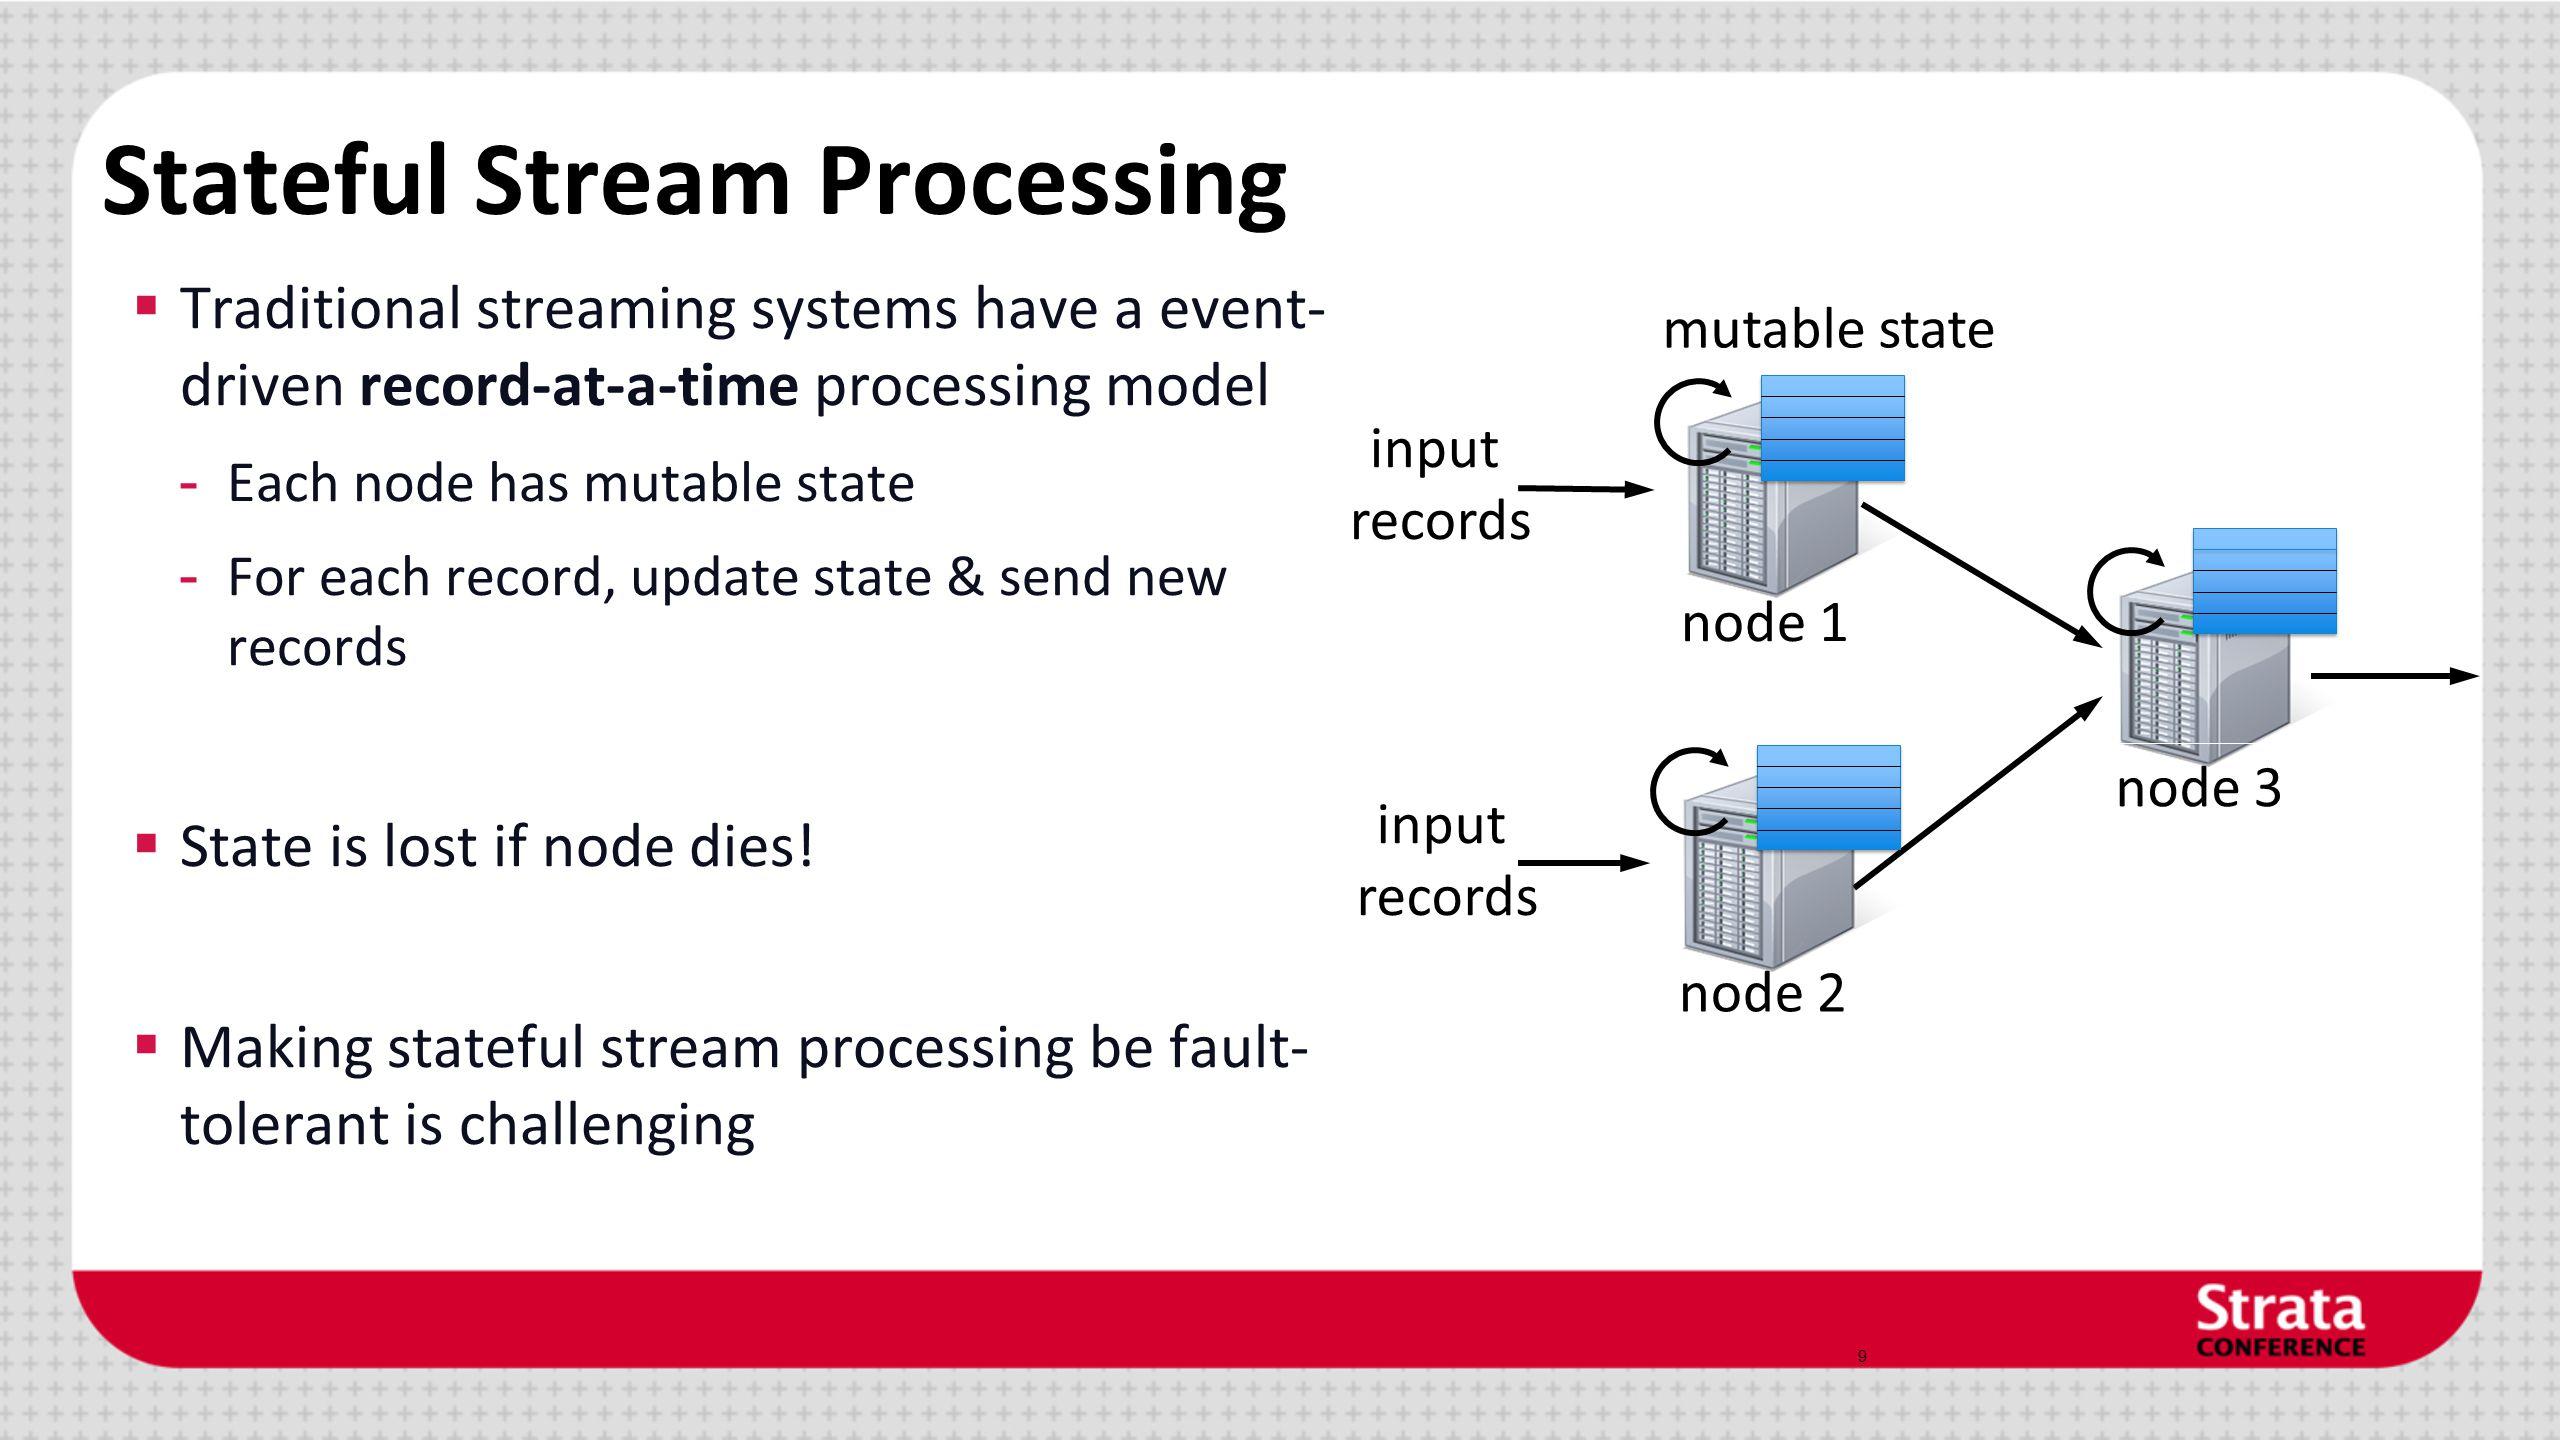 Stateful Stream Processing